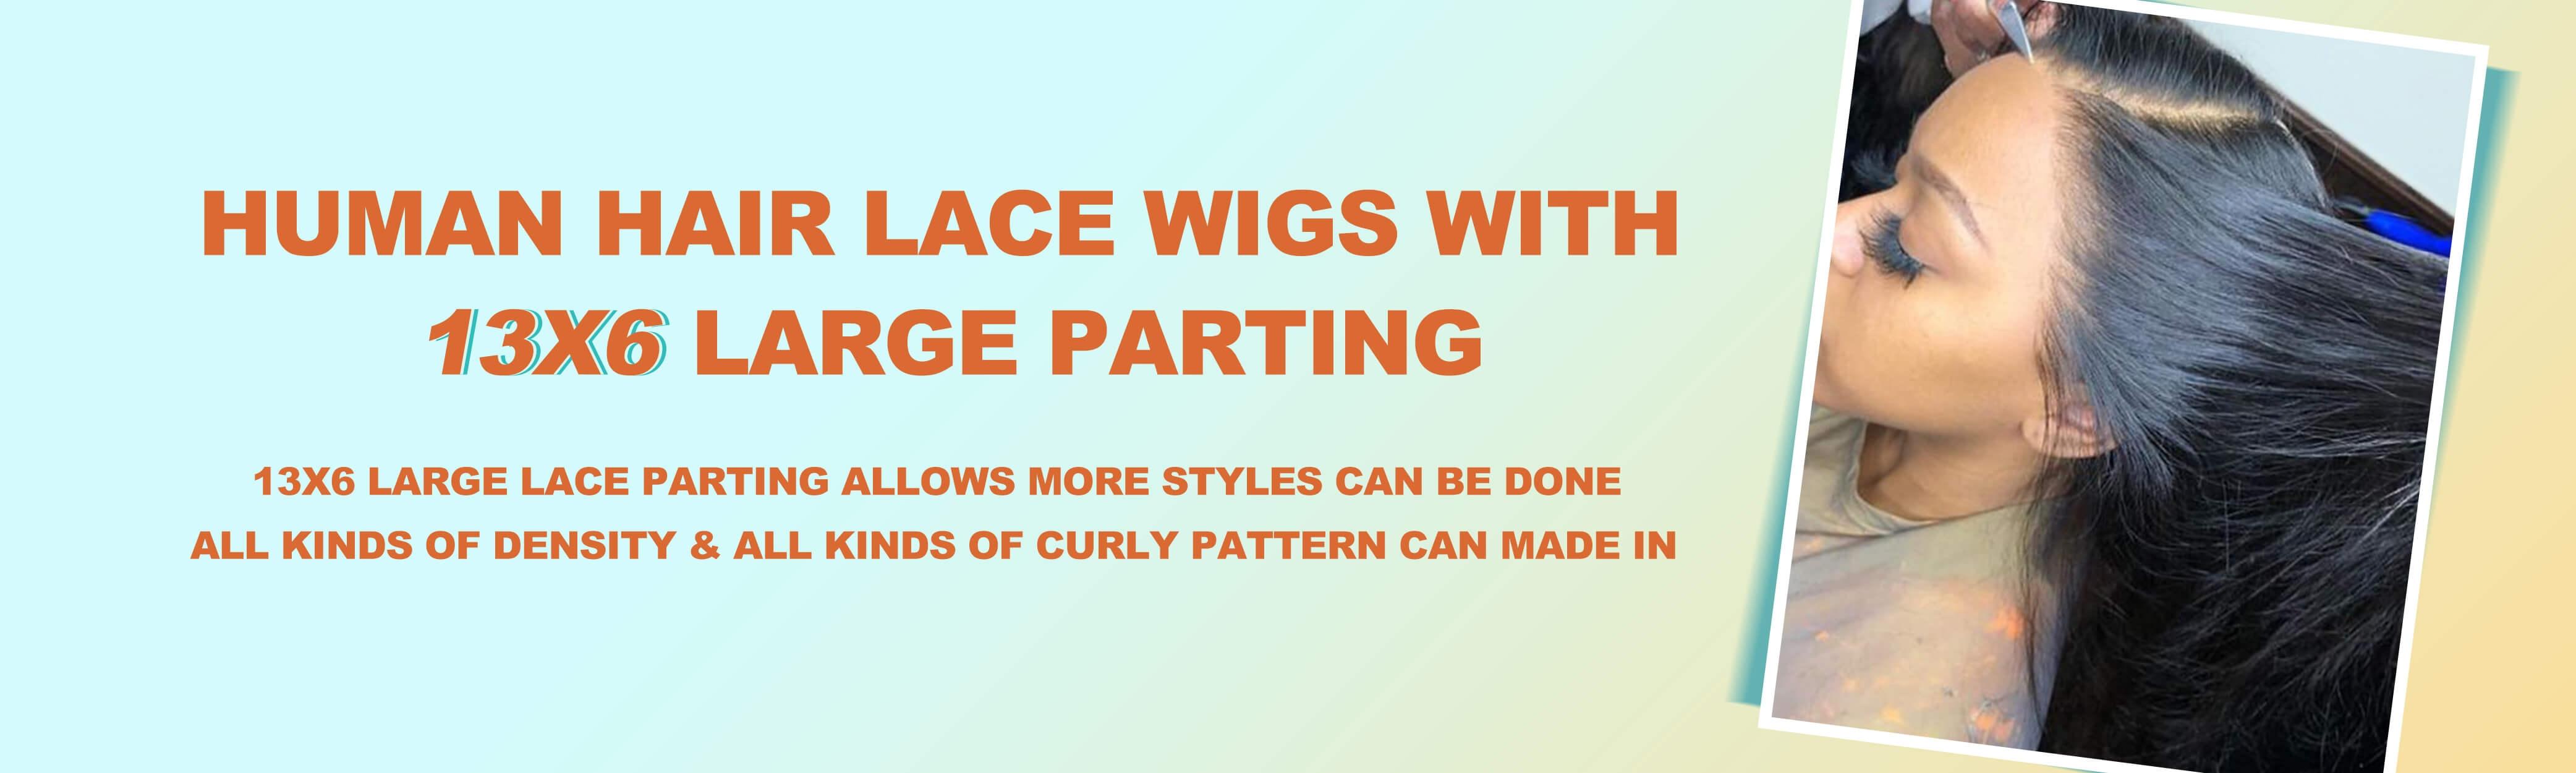 13x6 Lace Wigs